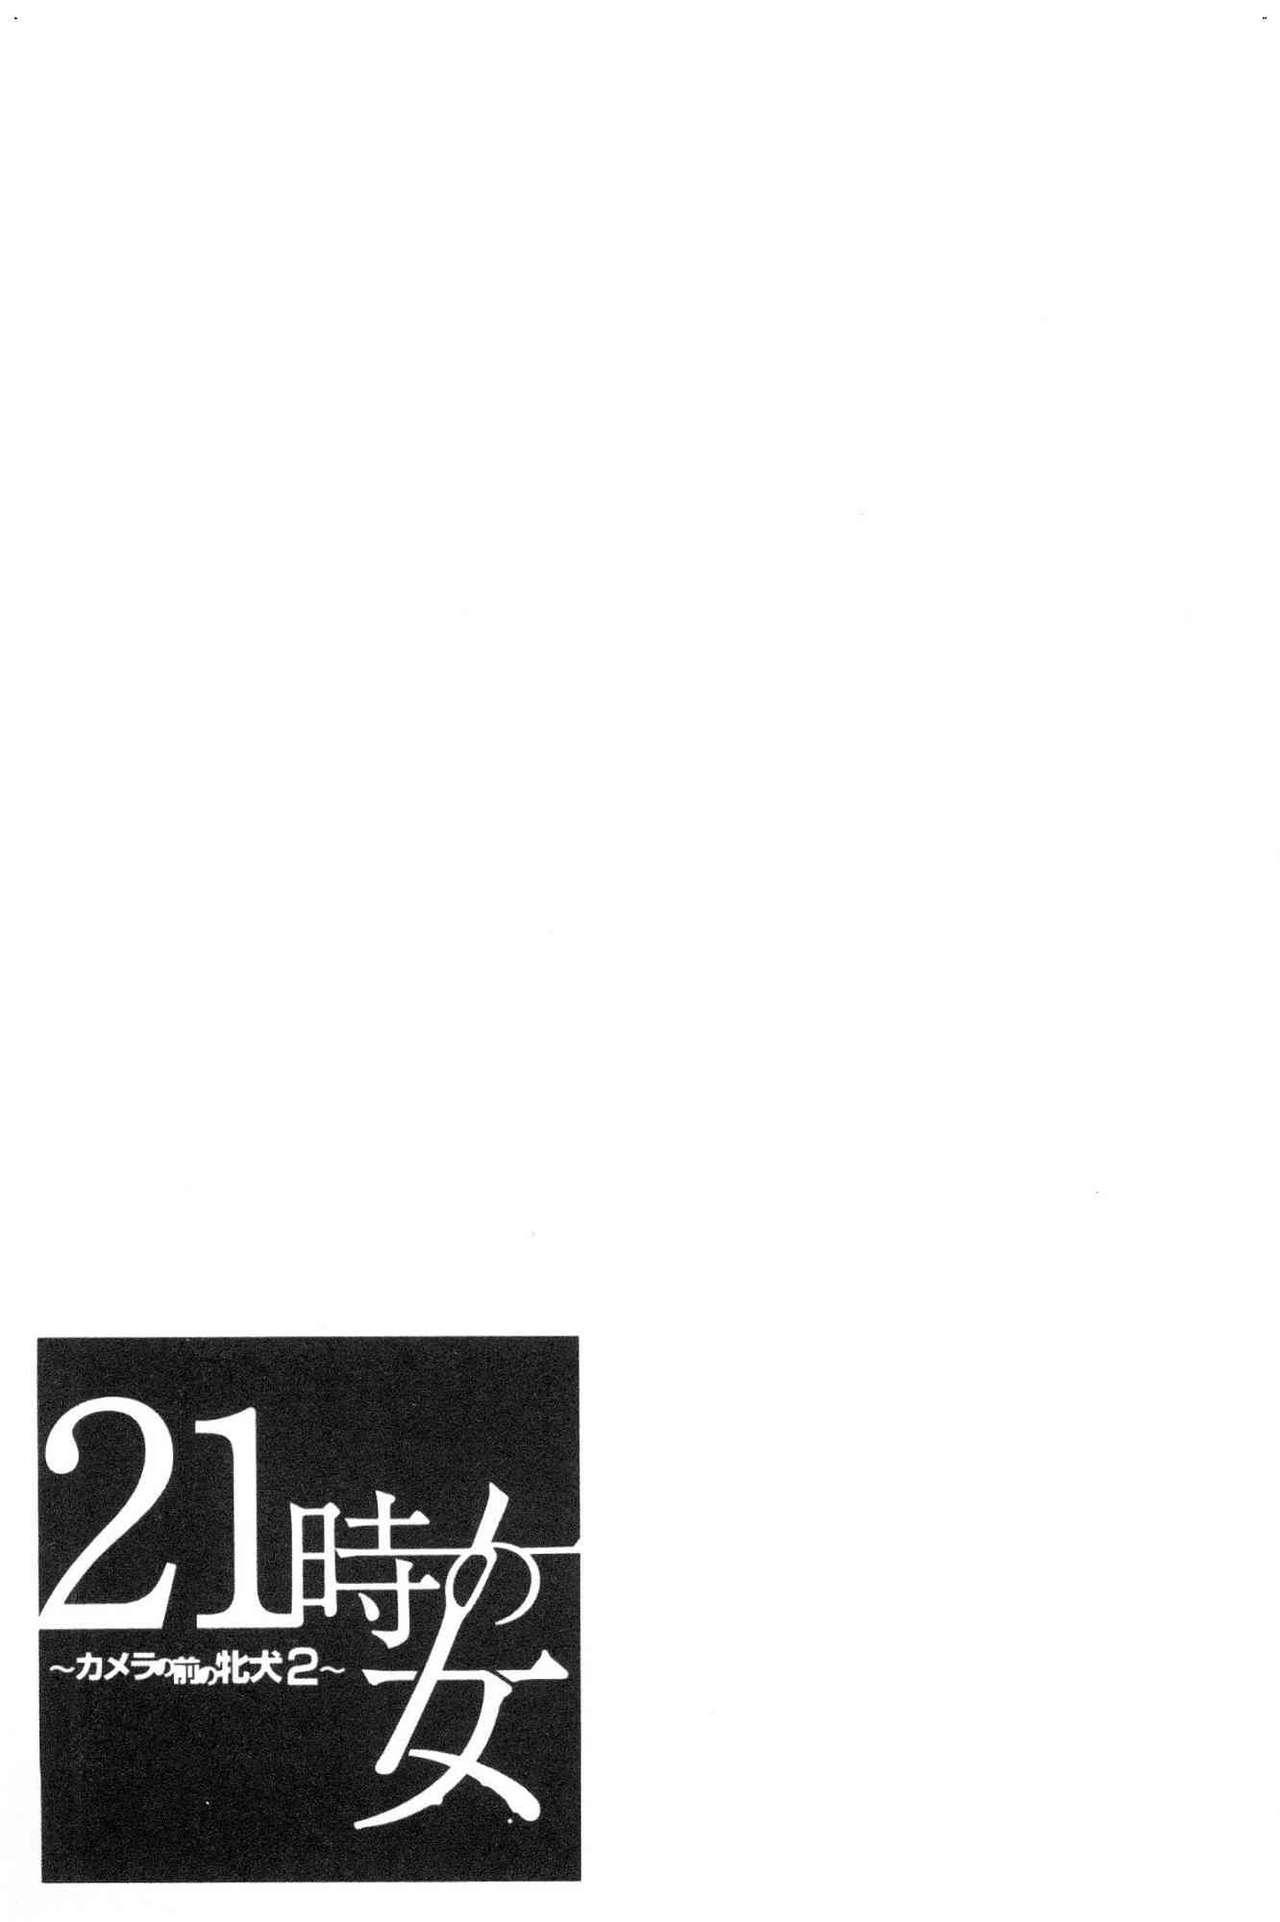 [Gotoh Akira]  21-ji no Onna ~Camera no Mae no Mesuinu~ 2 | 21時之女 ~鏡頭前的牝犬~ 2 [Chinese] 74